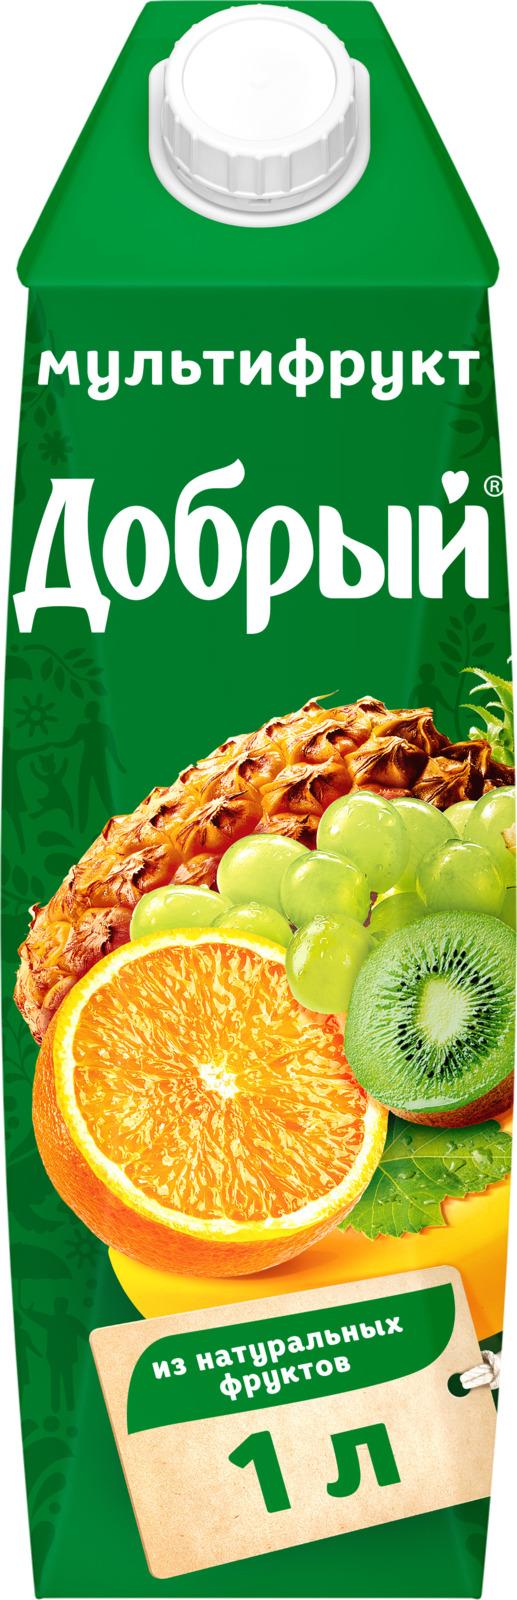 Нектар Добрый Мультифрут, 1 л нектар добрый мультифрут